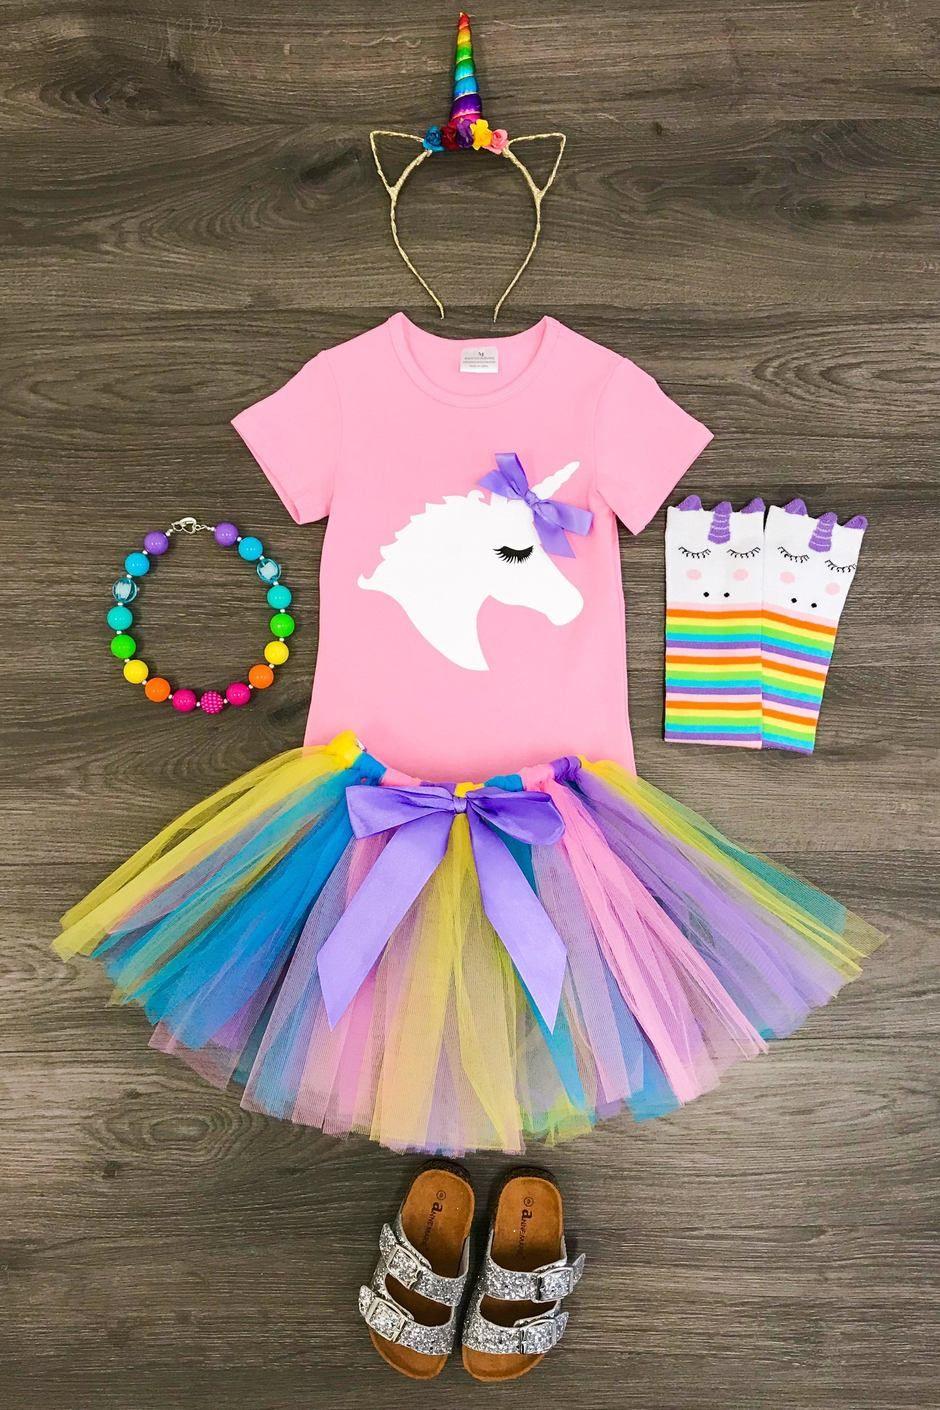 3PCS Big Sister Girls Outfits Long Sleeve Shirt+Rainbow Tutu Skirt+Headband Cute Clothing Sets